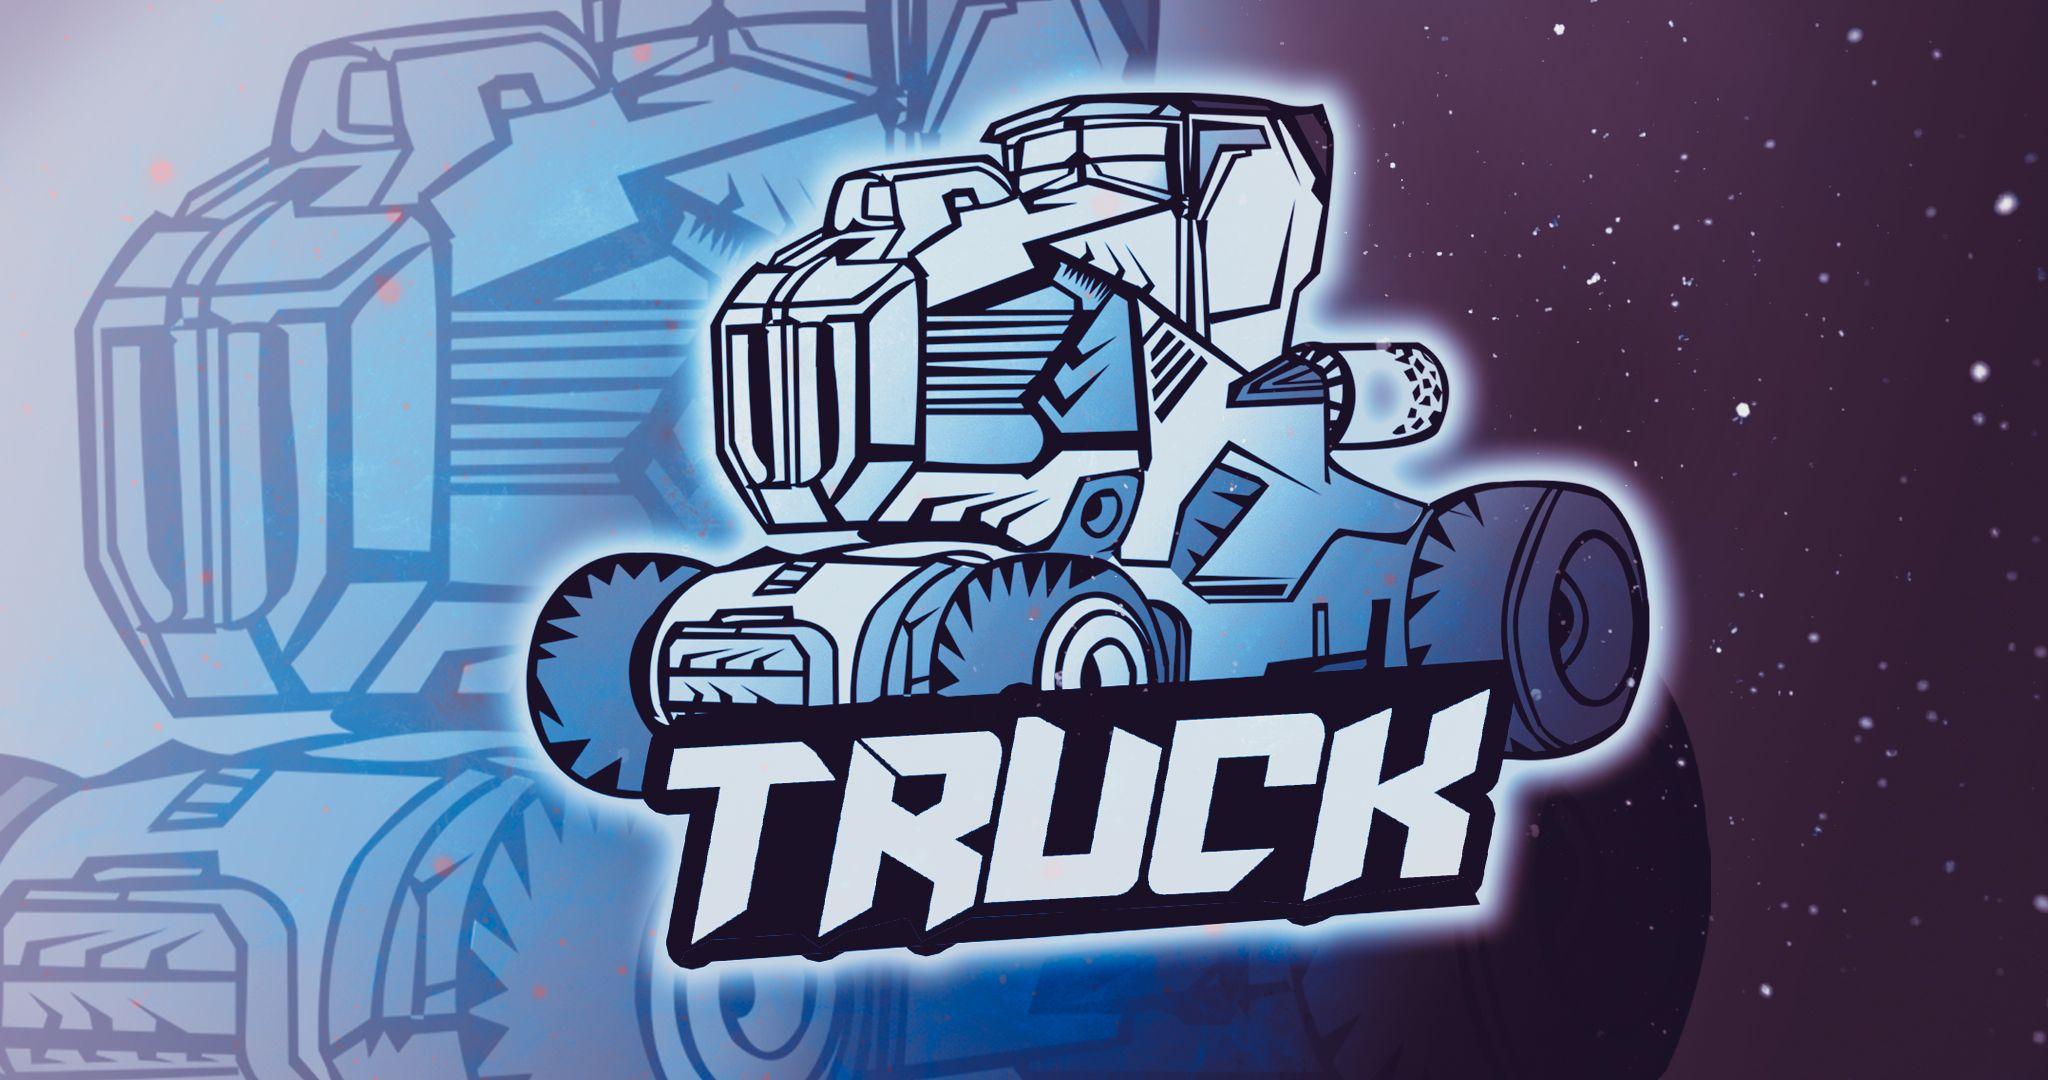 Esport TruckArt